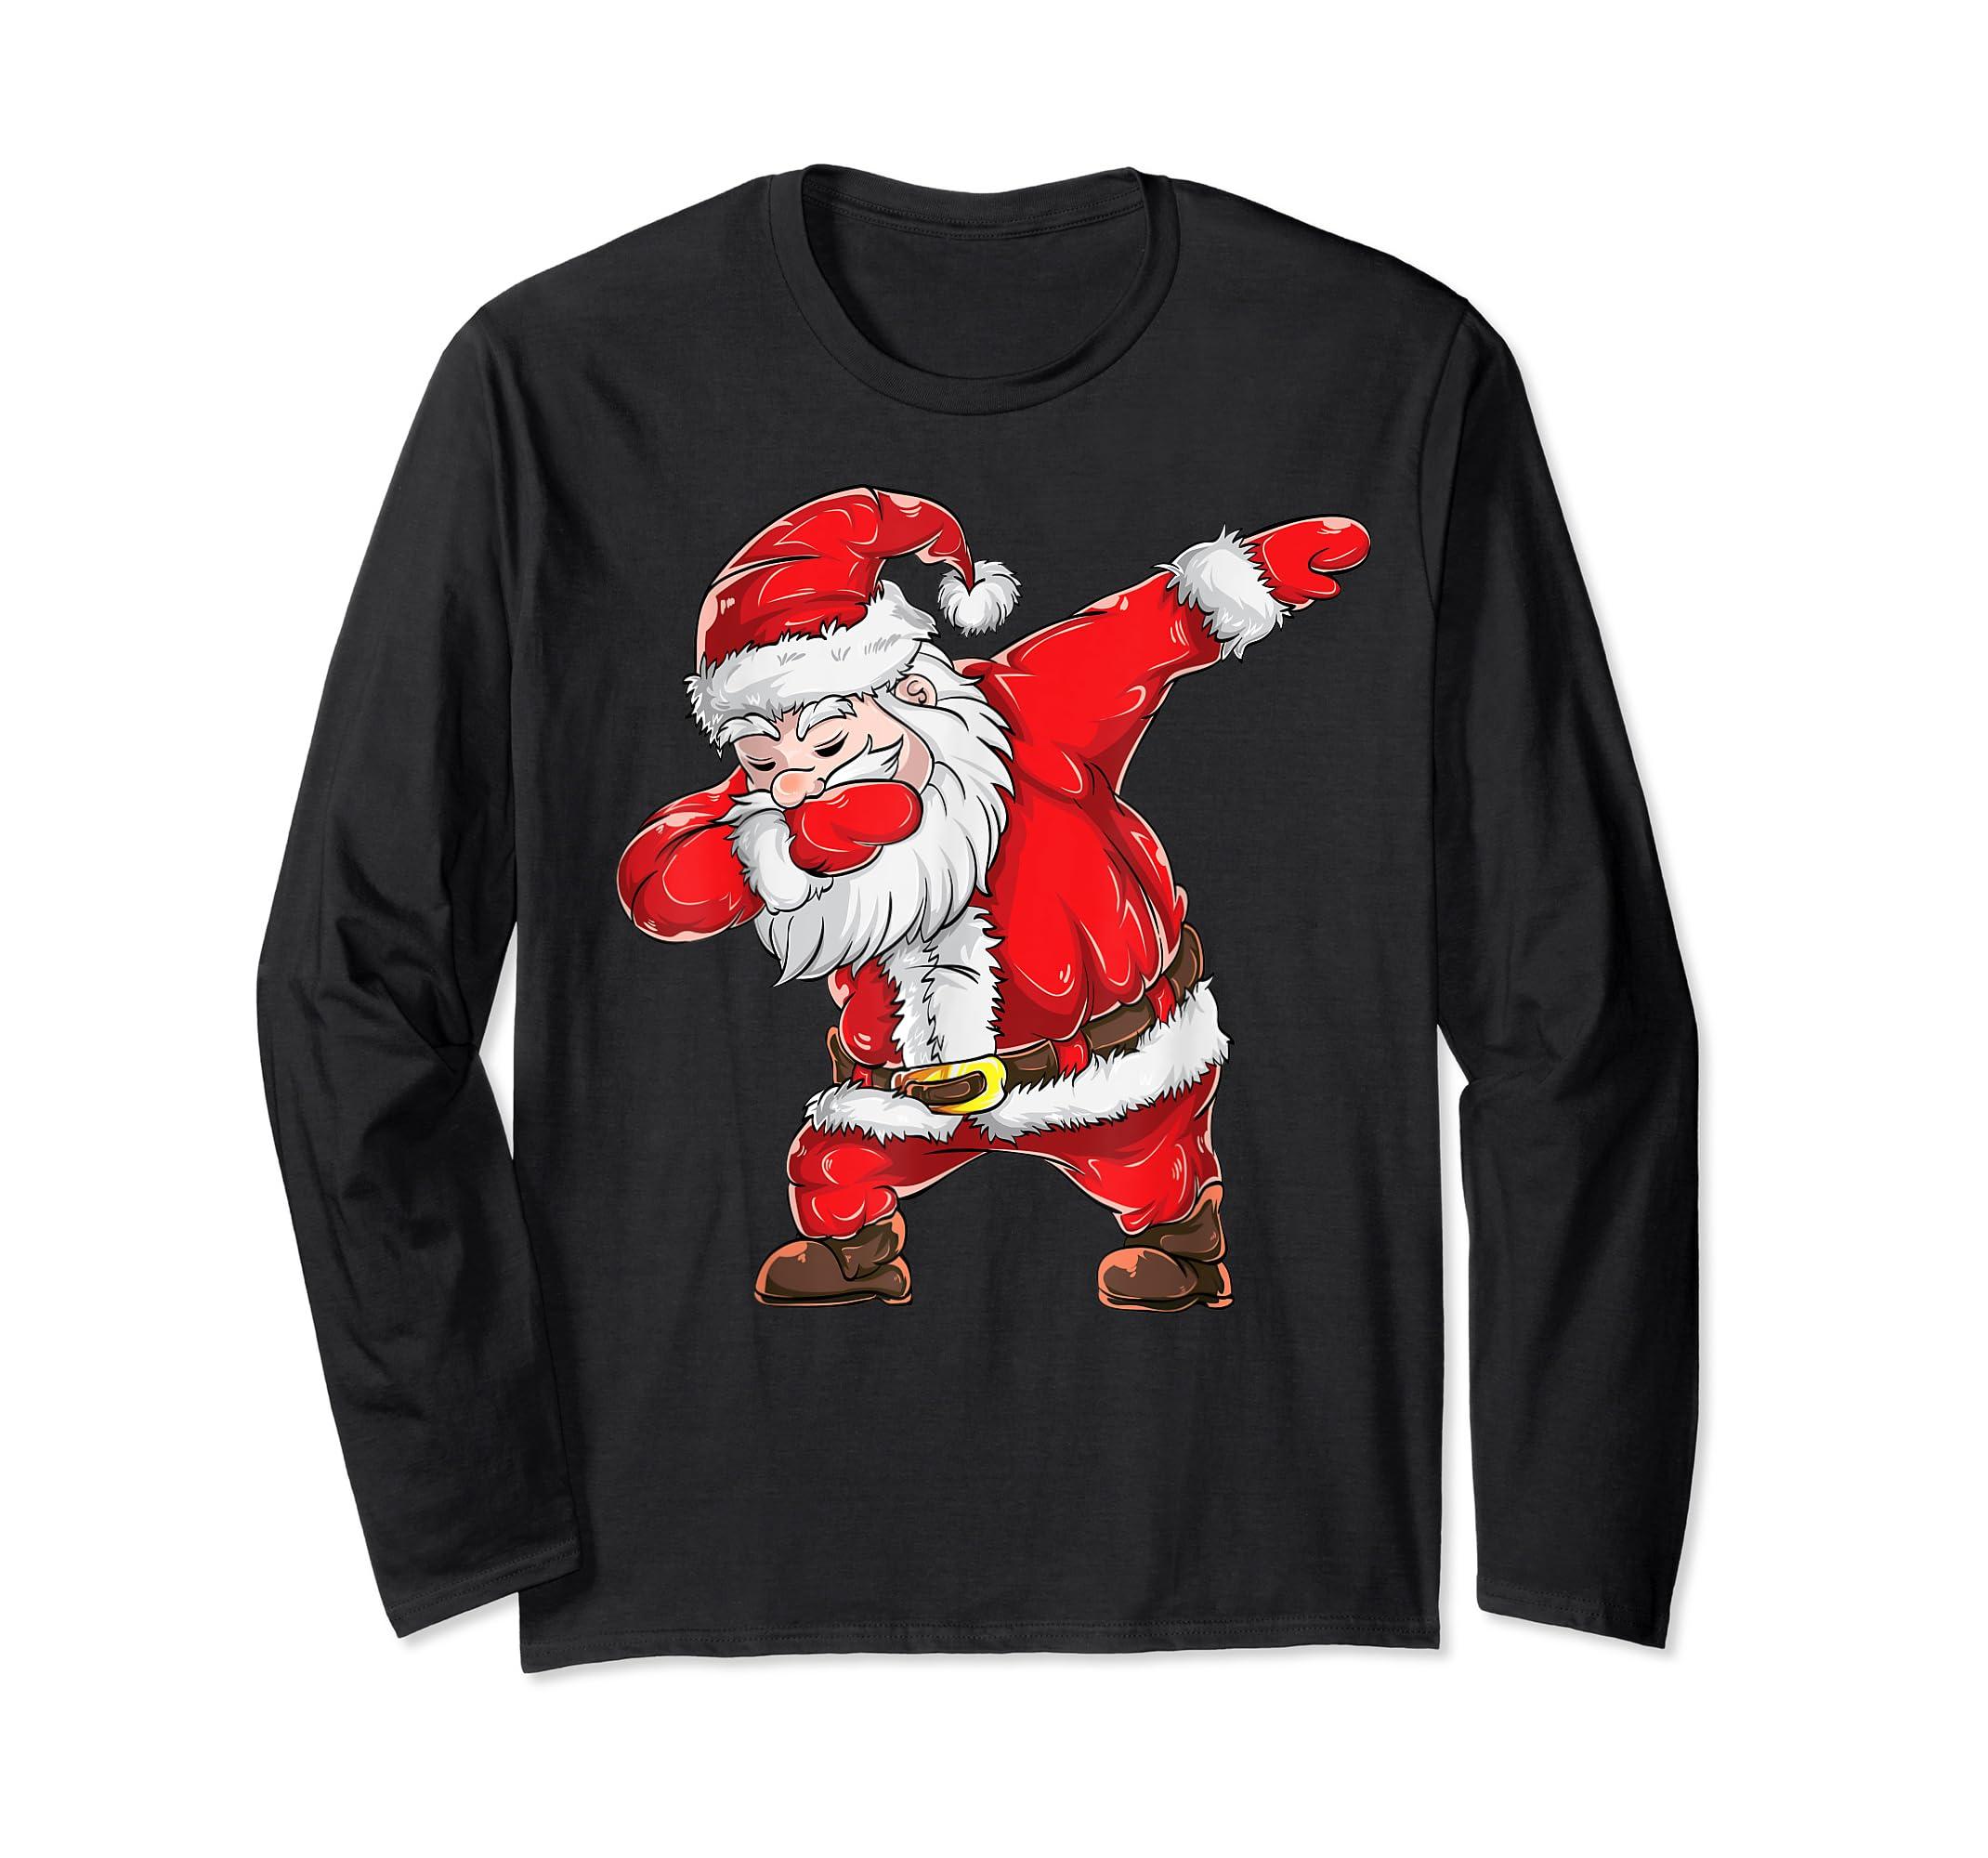 Dabbing Santa Claus Christmas Kids Boys Girls Dab Xmas Dance T-Shirt-Long Sleeve-Black